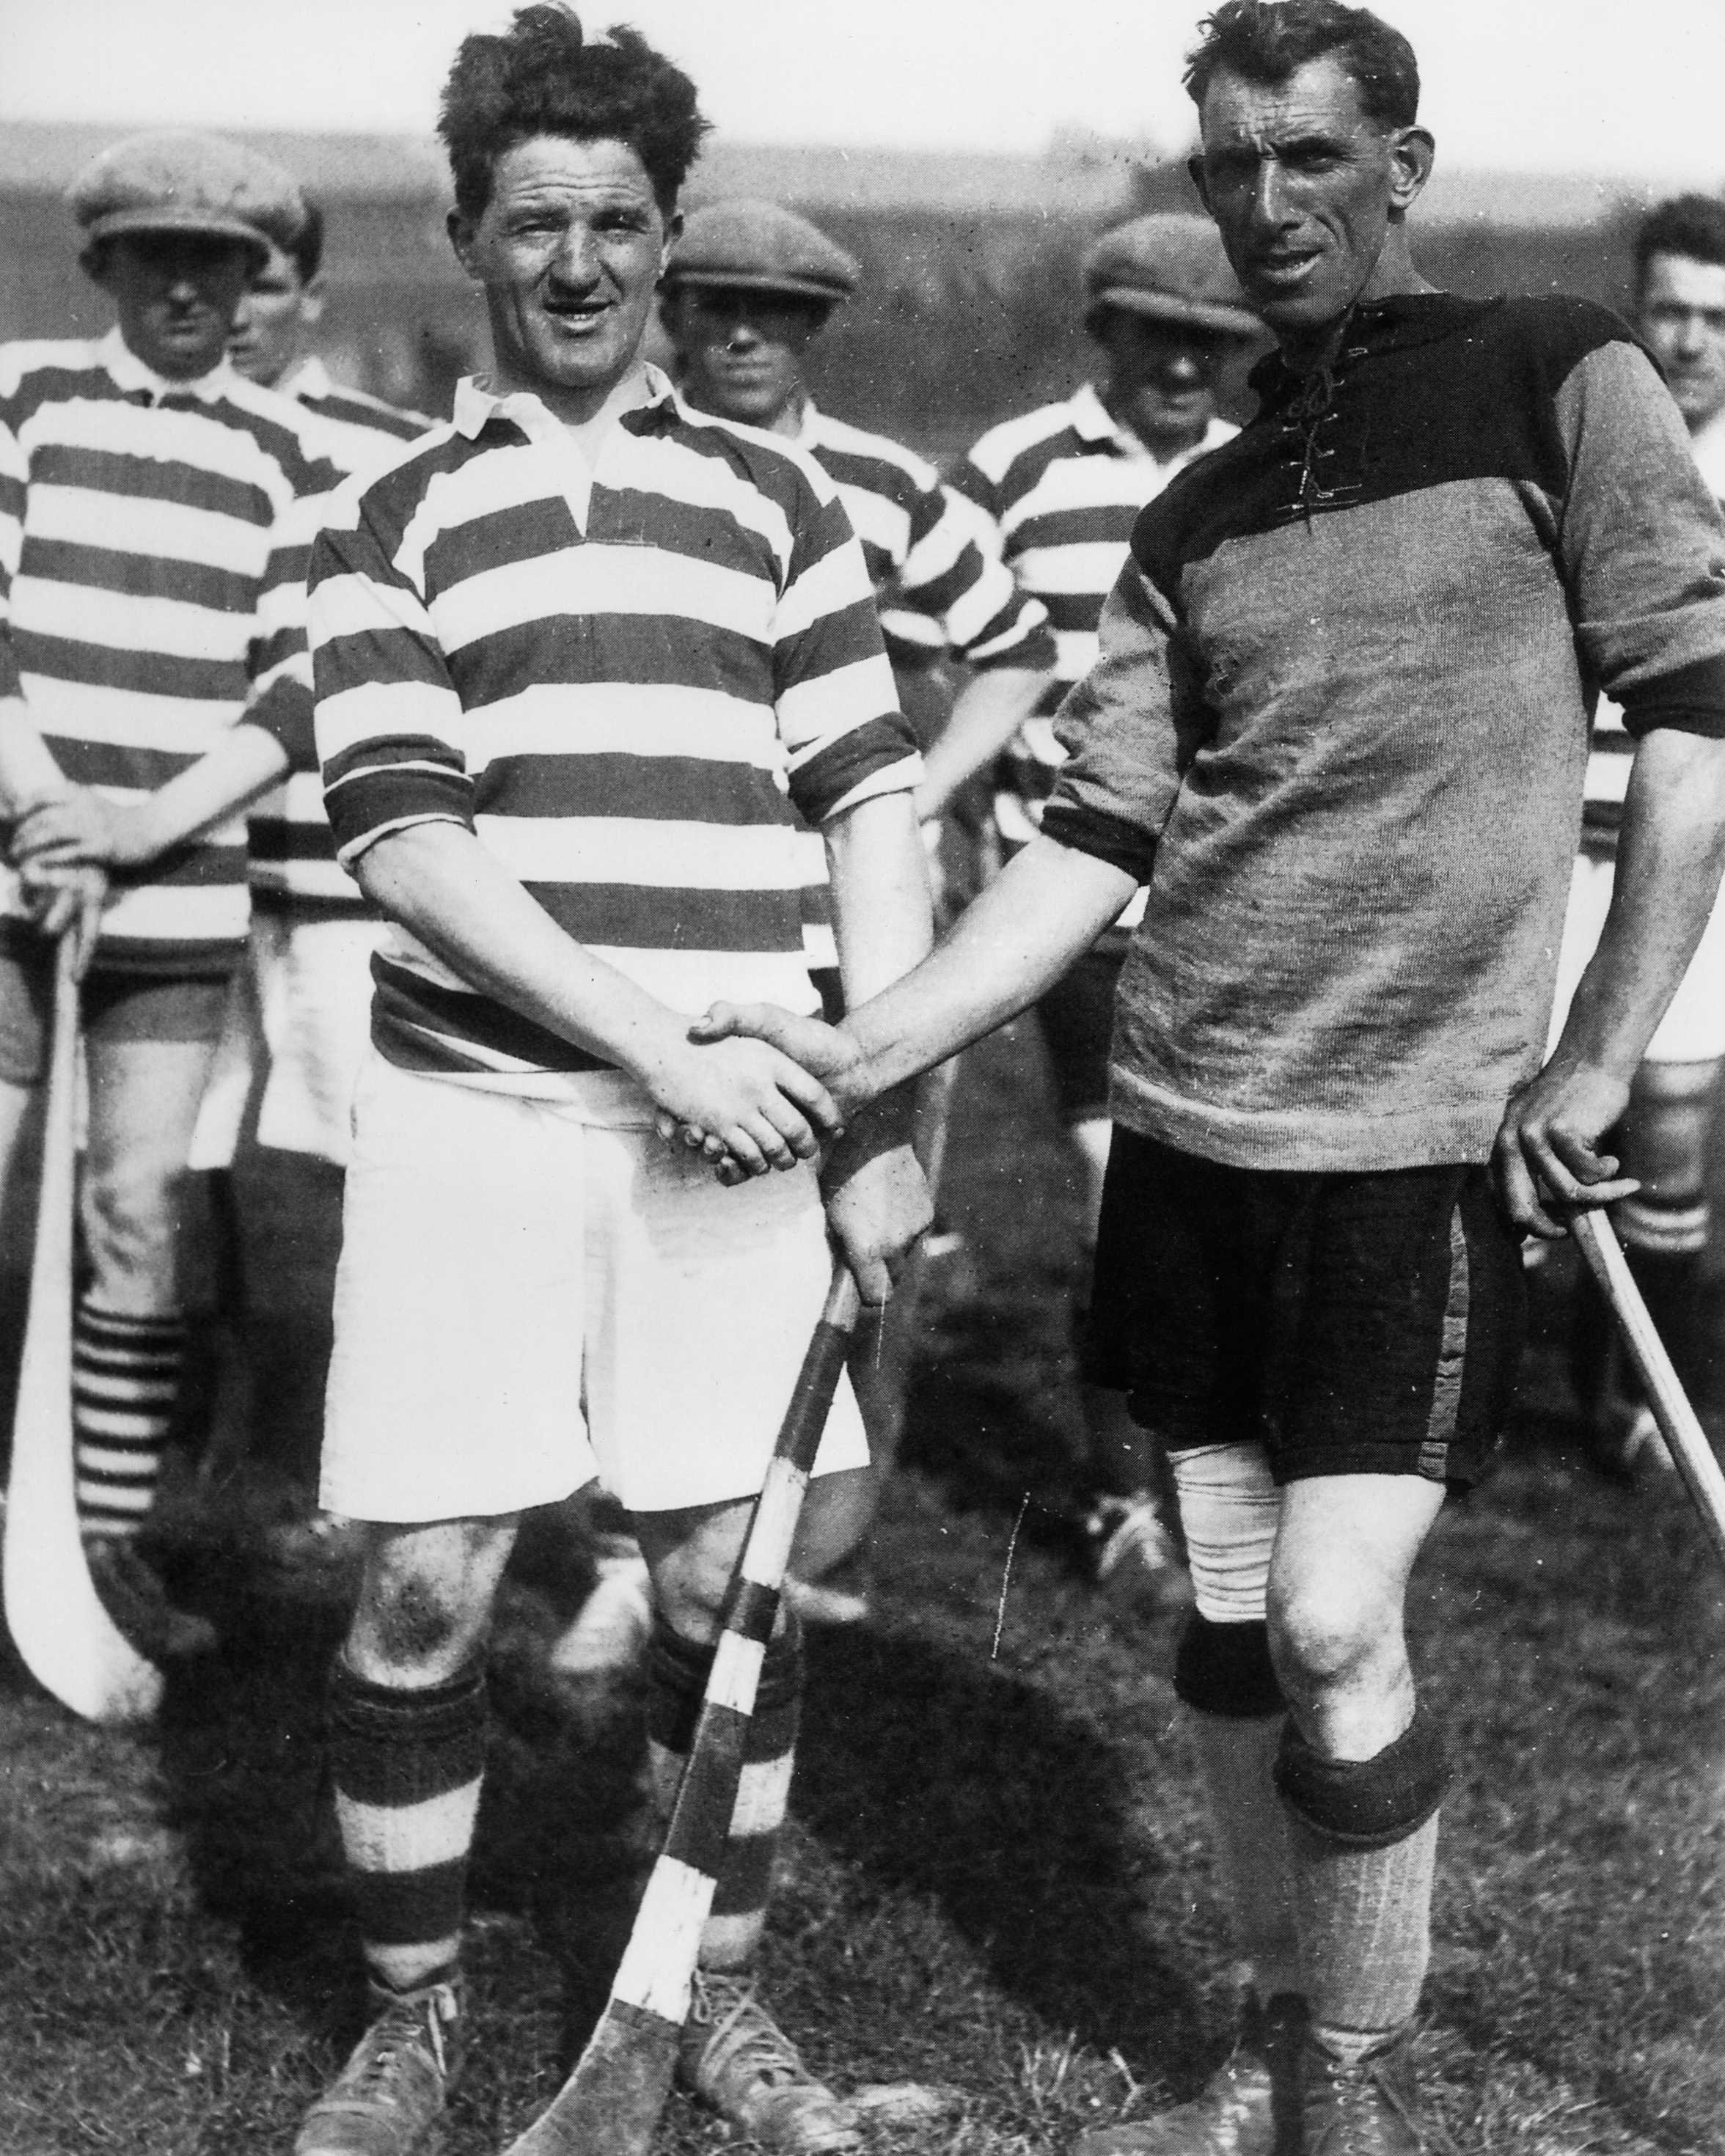 1923 Hurling All-Ireland Final Captains